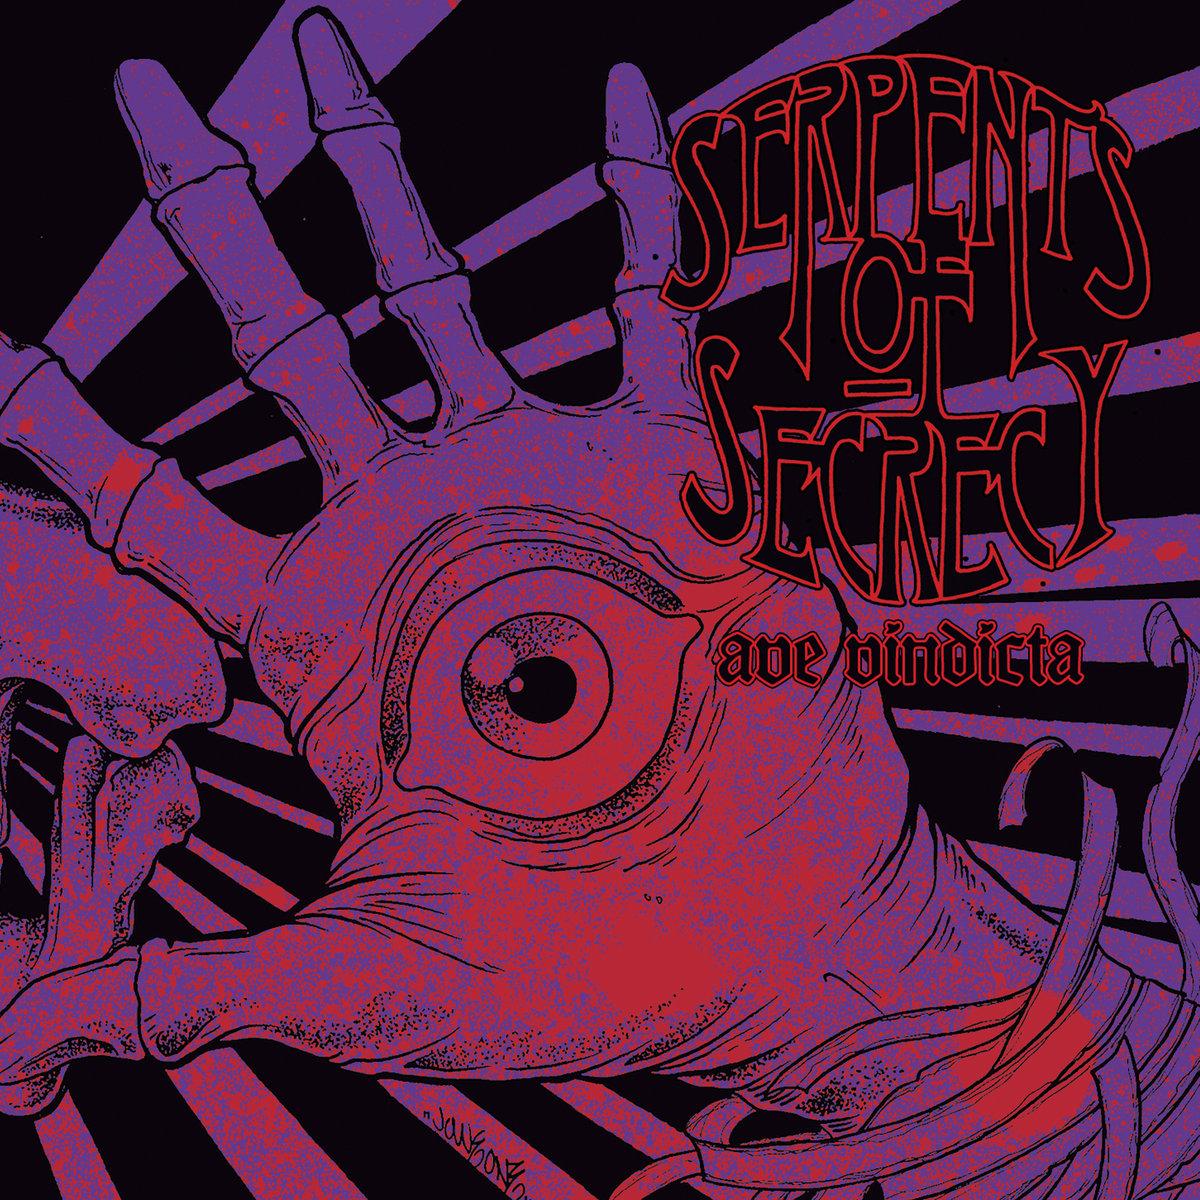 track-premiere:-serpents-of-secrecy-–-'heel-turn'